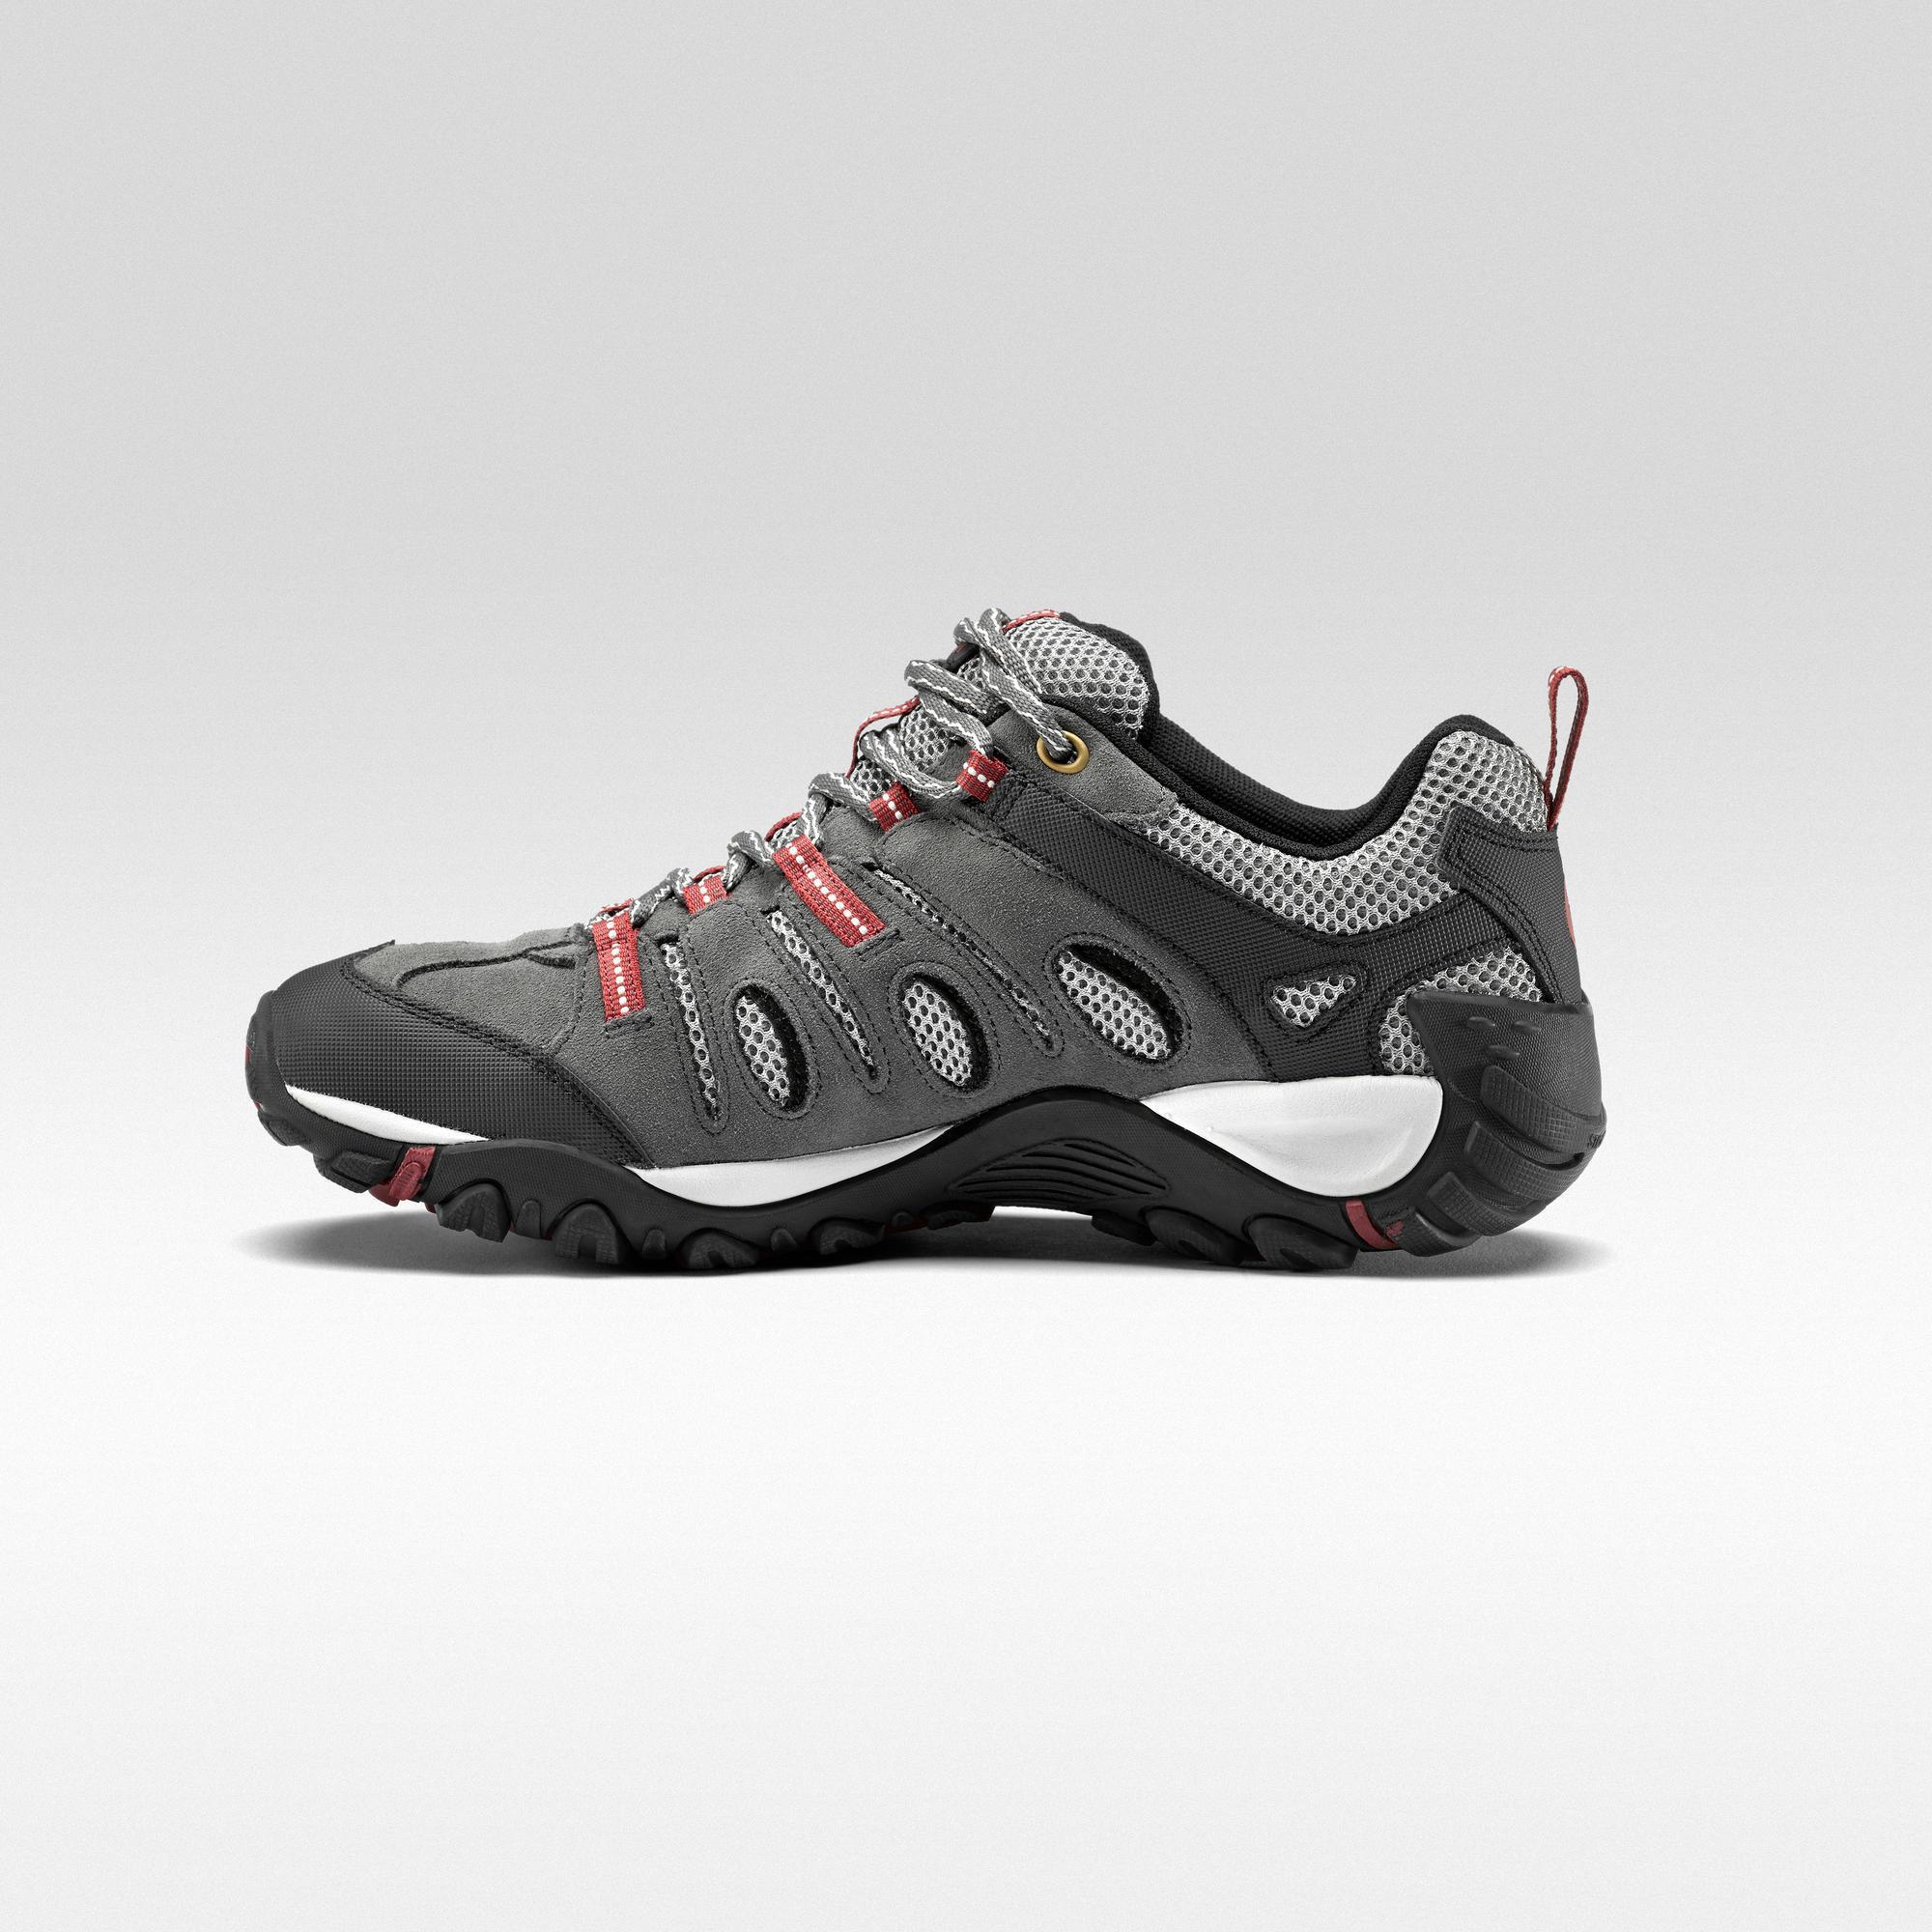 zapatos merrell decathlon qatar